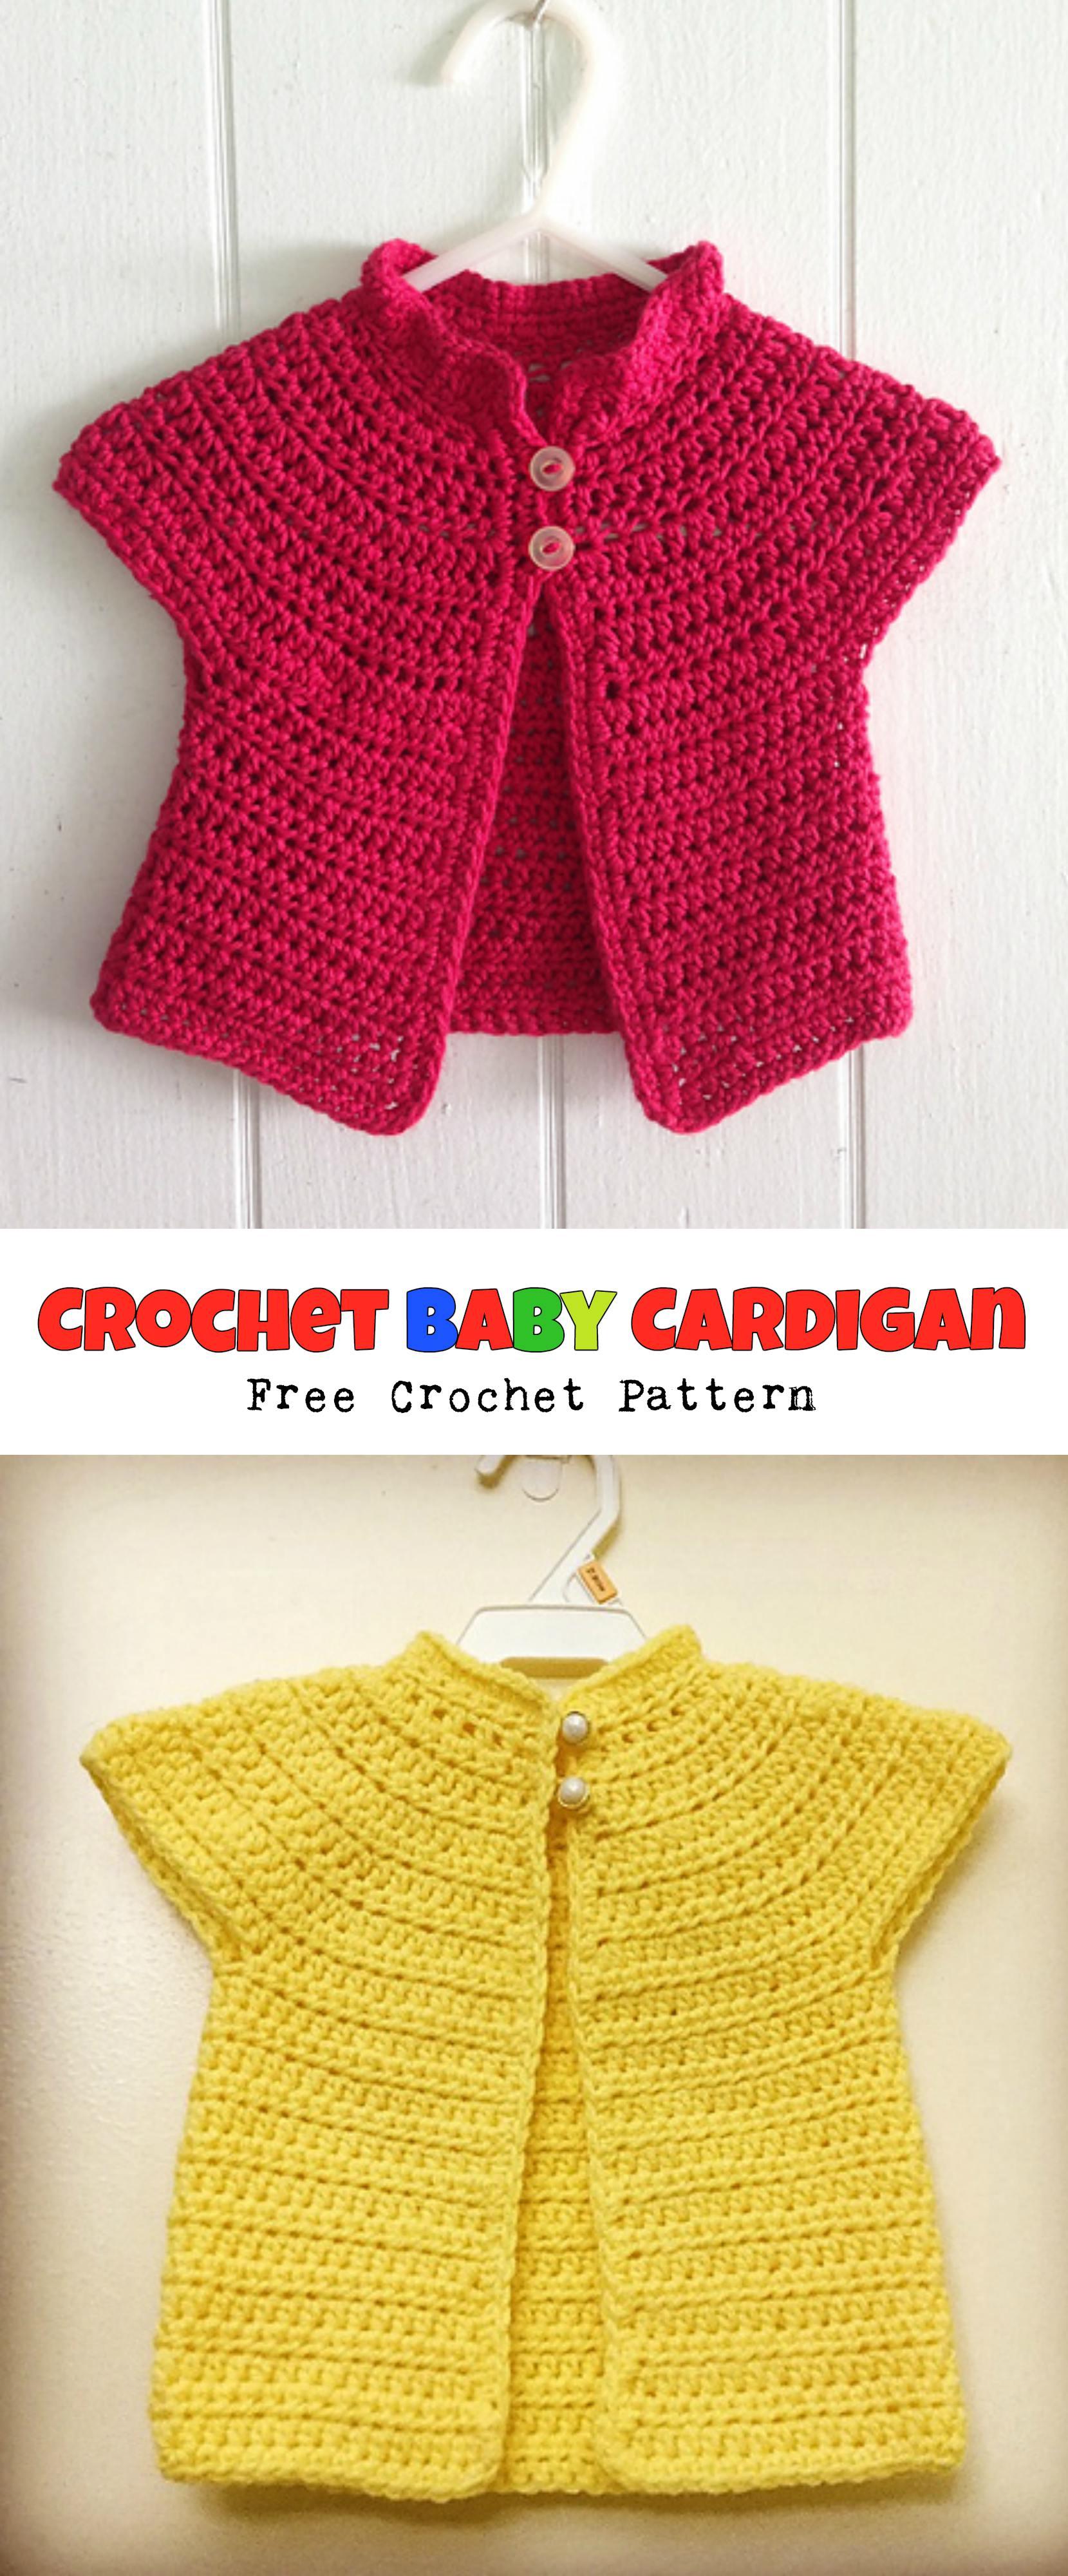 49cad2d2b Baby Cardigan - FREE Pattern - Pretty Ideas